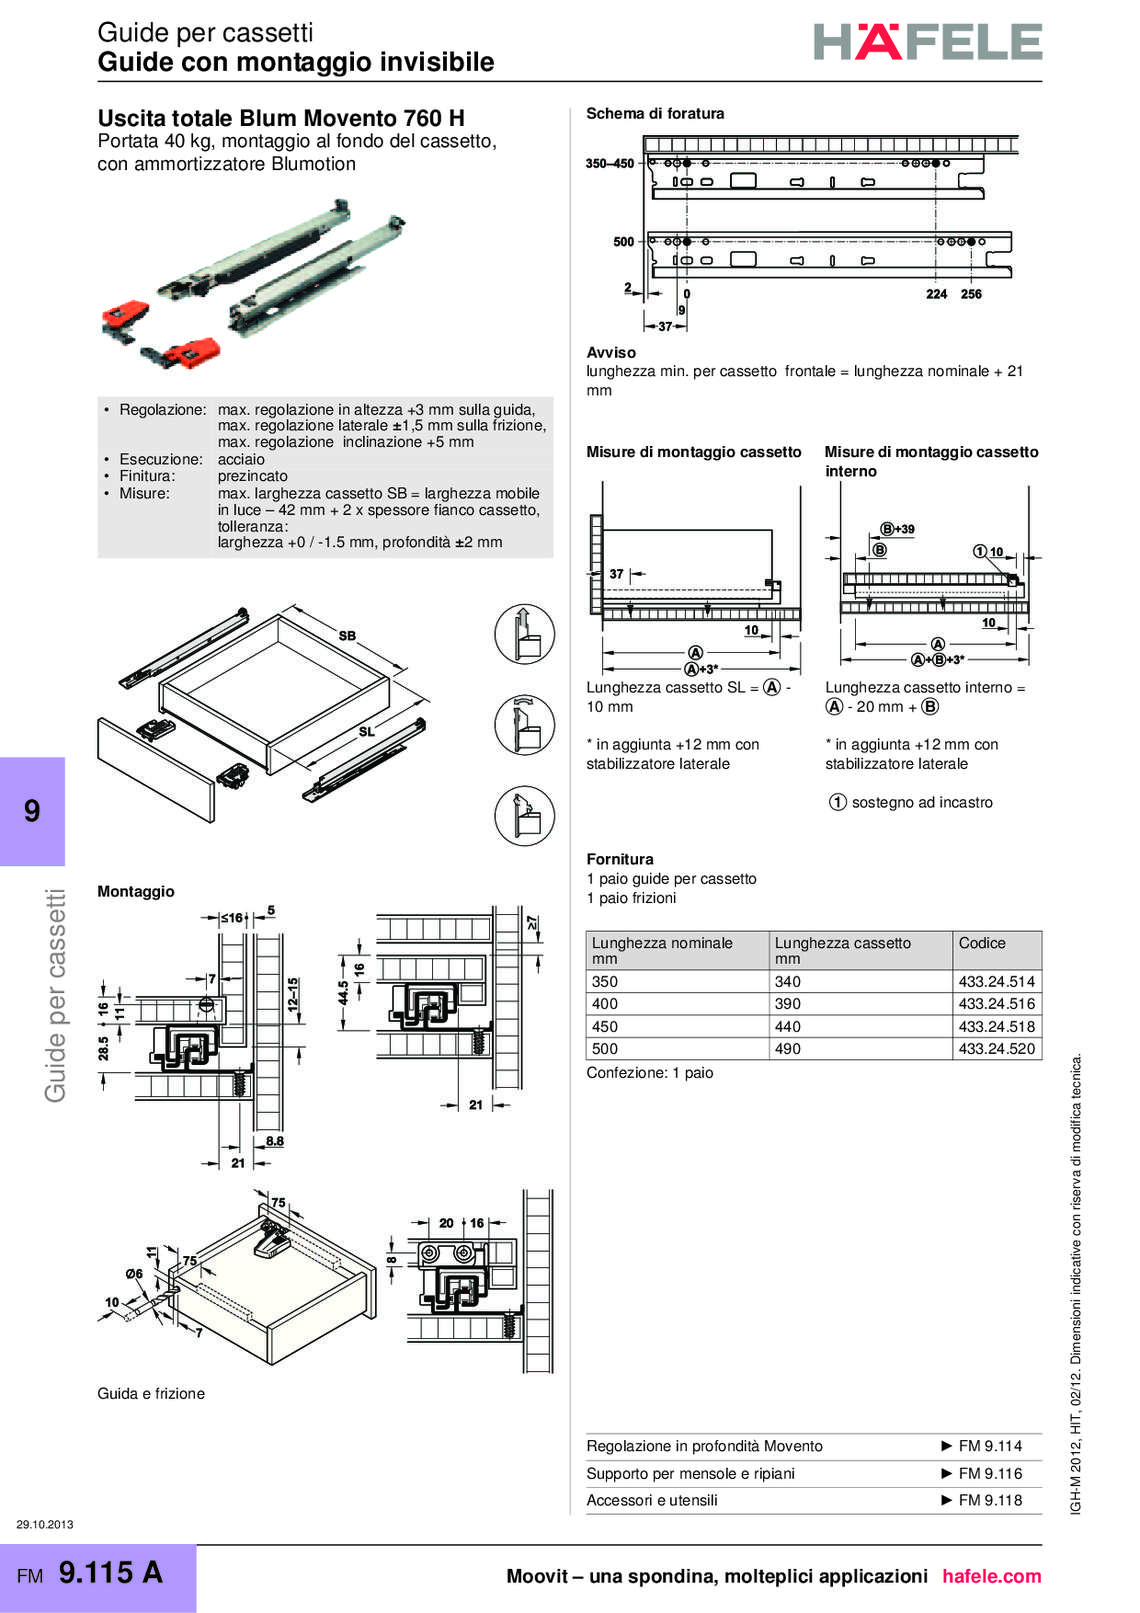 hafele-spondine-e-guide-per-mobili_40_163.jpg